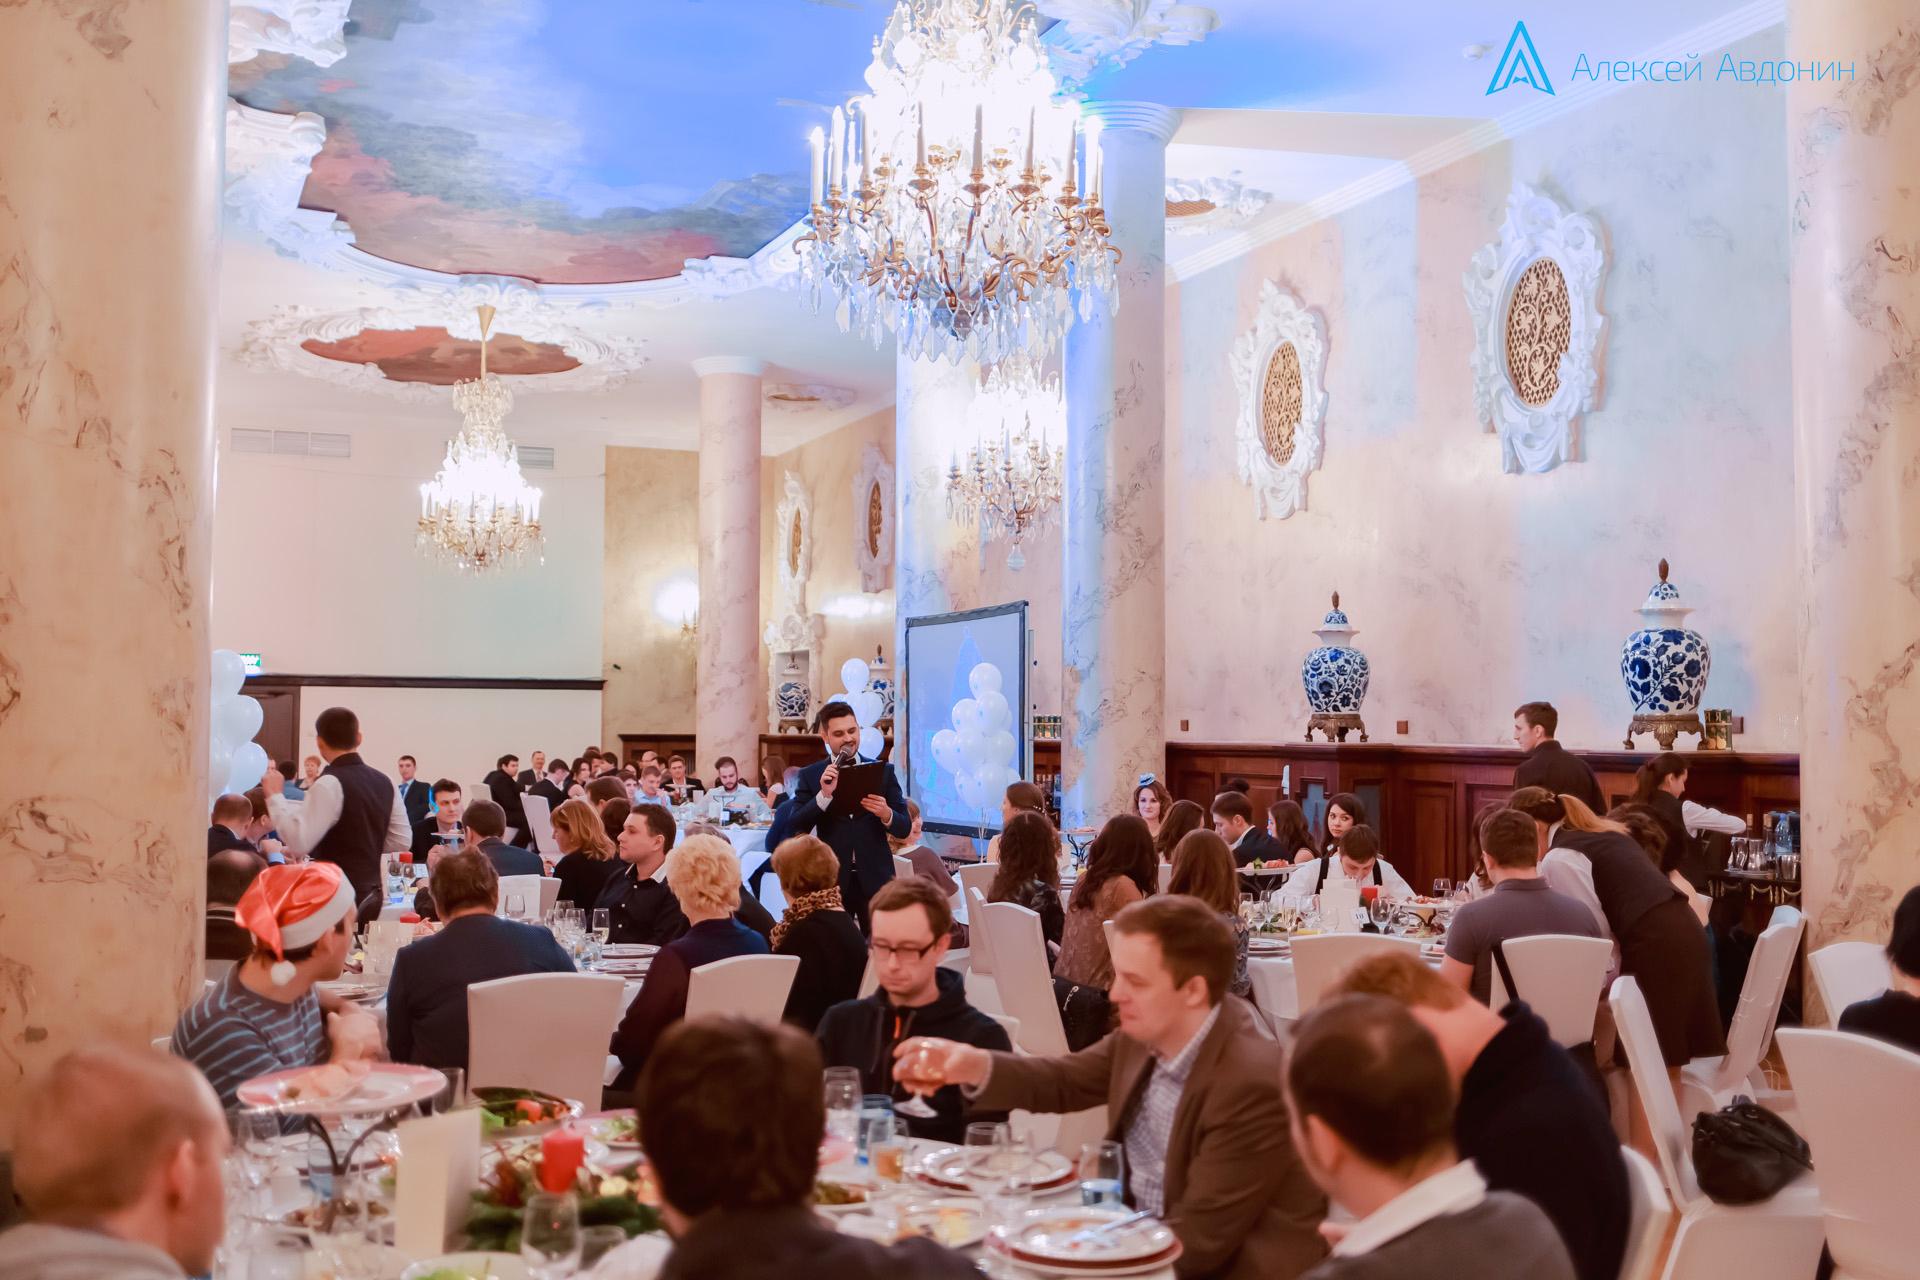 Алексей Авдонин - Moscow Hilton Leningradskaya - Lexicon Development.jpg